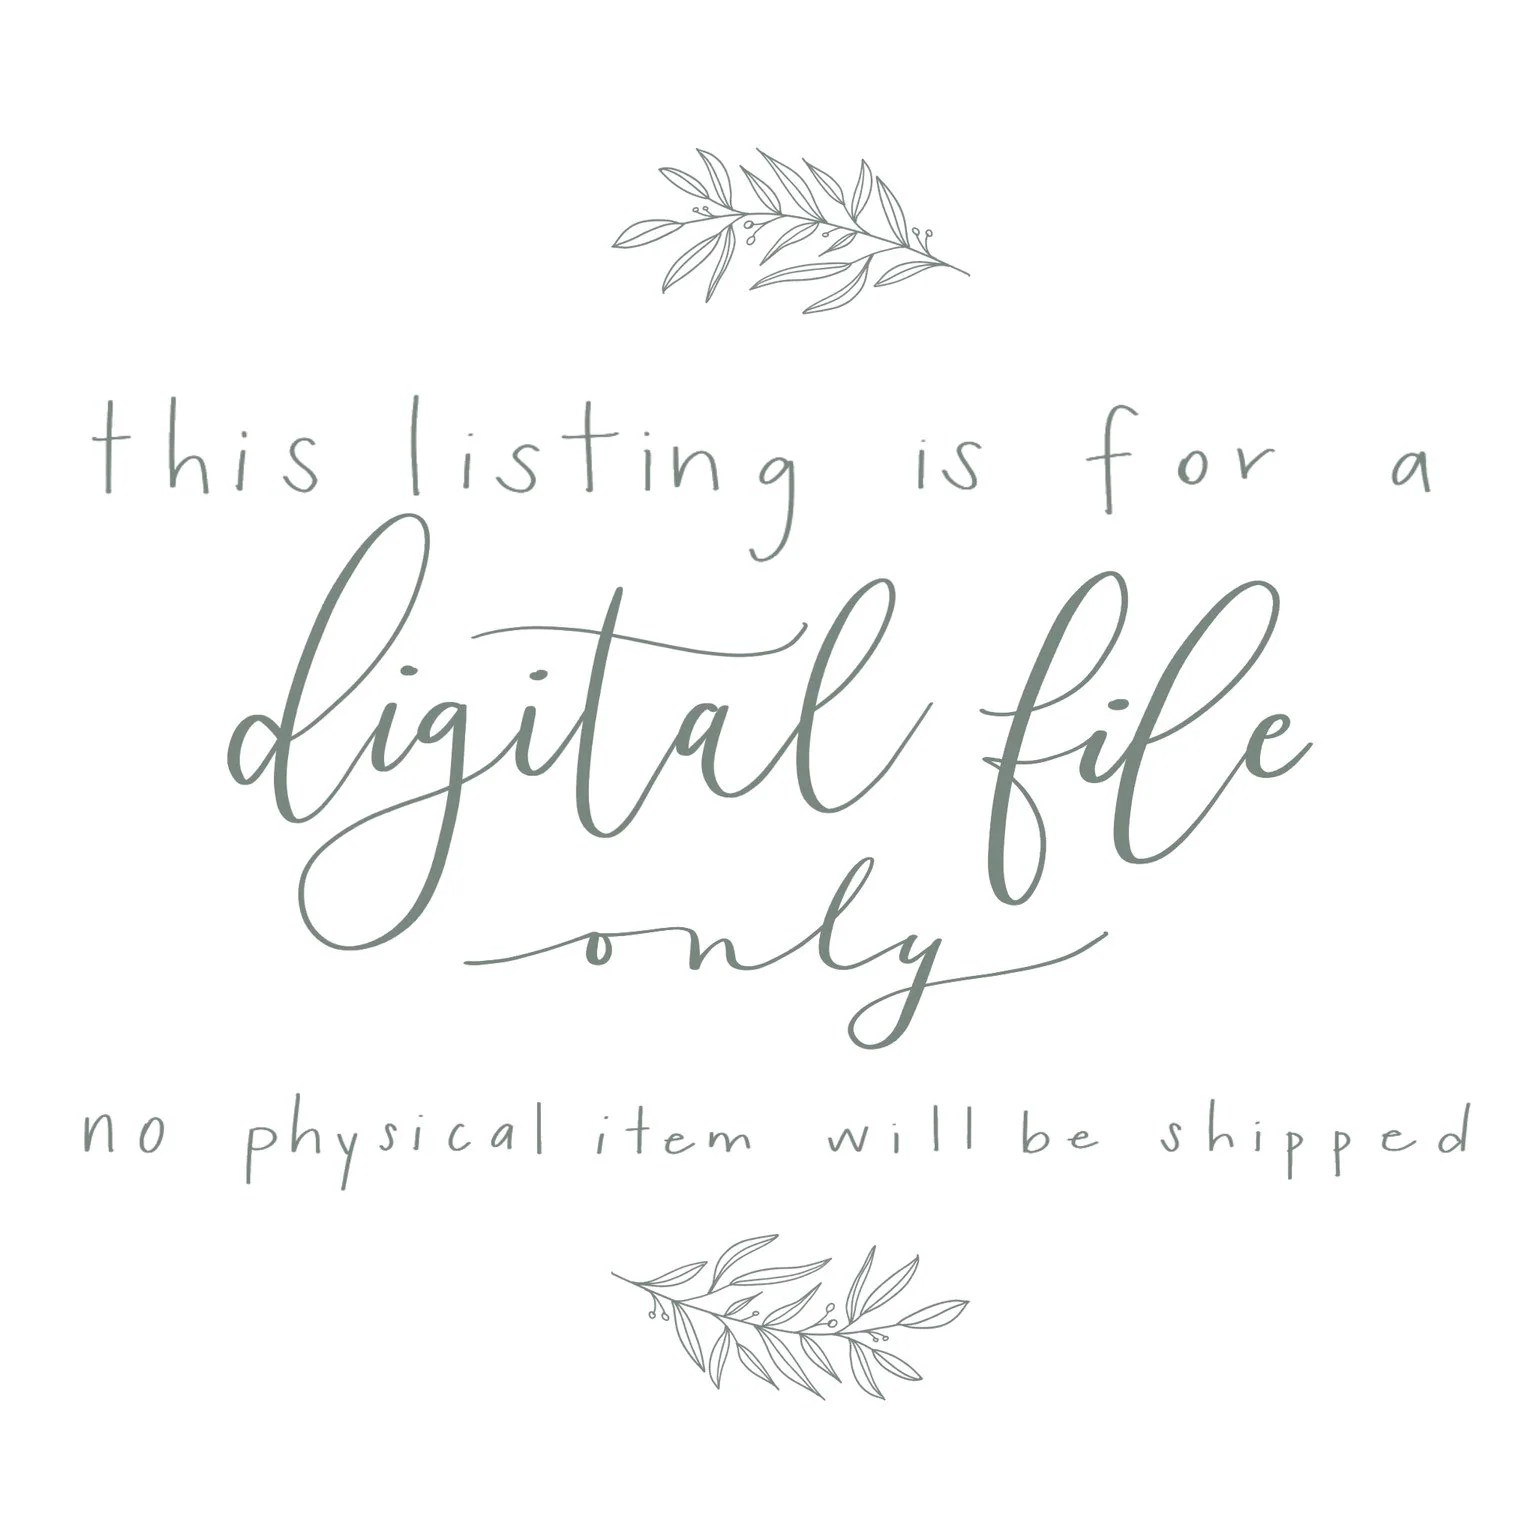 Digital Print Hand Lettered Bible Verse Isaiah 41:10